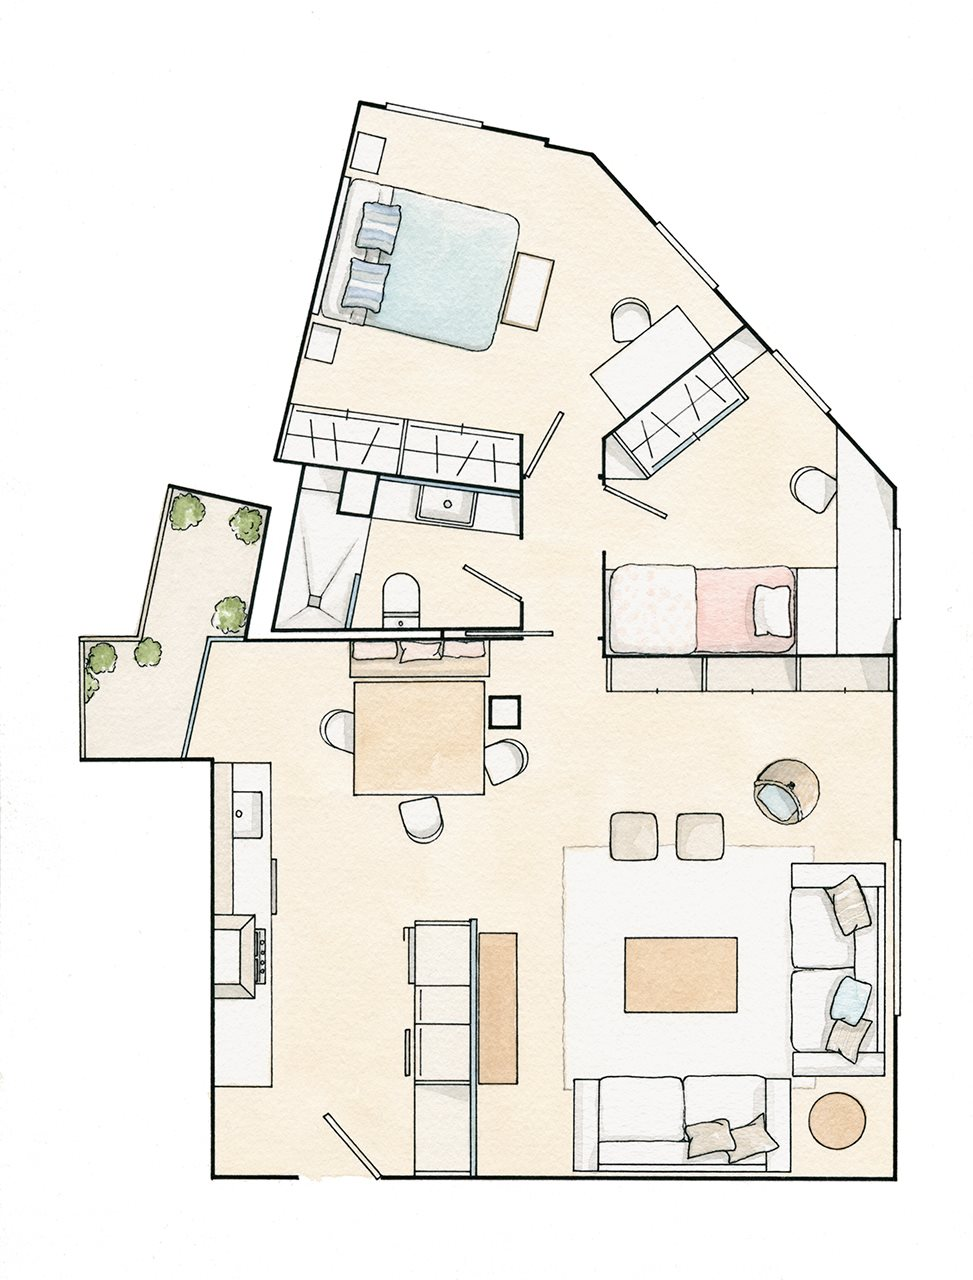 Дизайн трехкомнатной квартиры 60 кв м фото